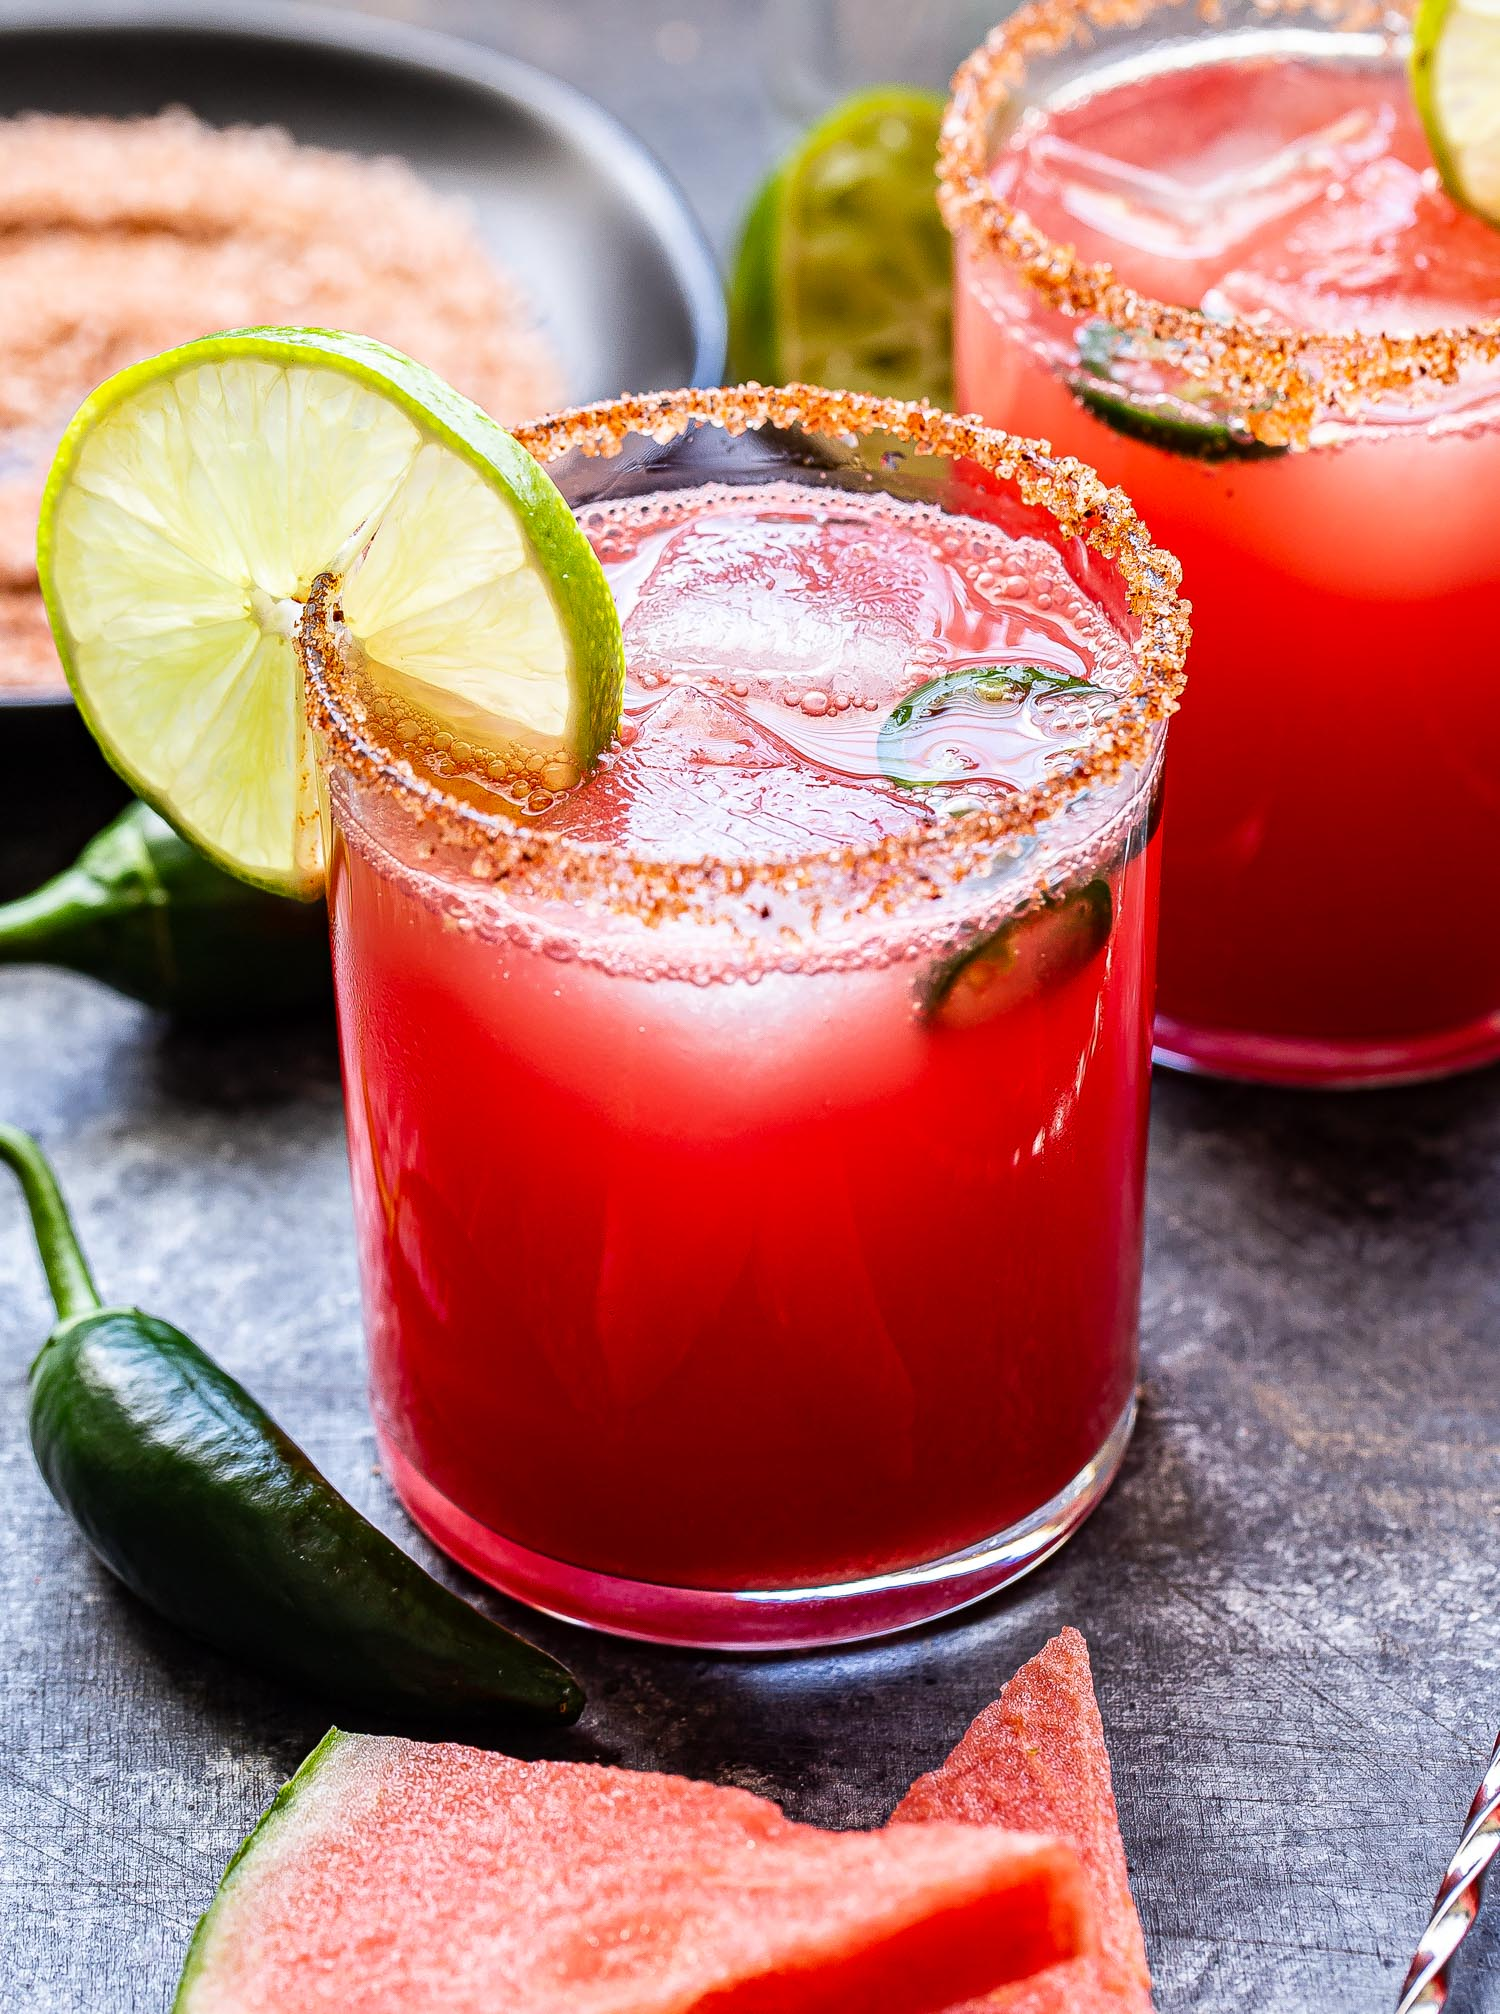 spicy watermelon margaritas picture - e.Allen Boutique